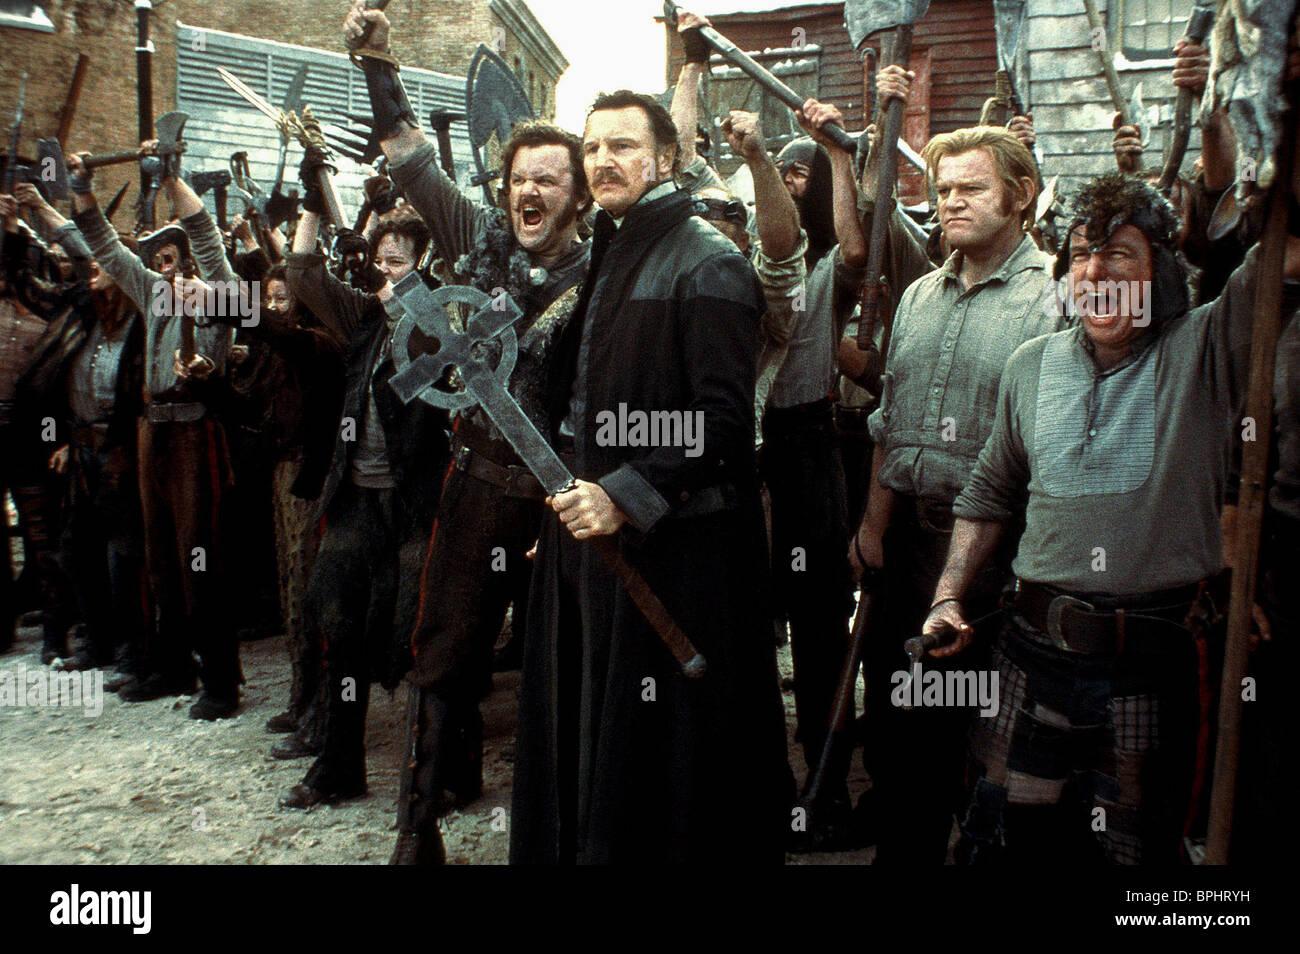 John C Reilly Liam Neeson Brendan Gleeson Gangs Of New York Foto Amp Immagine Stock